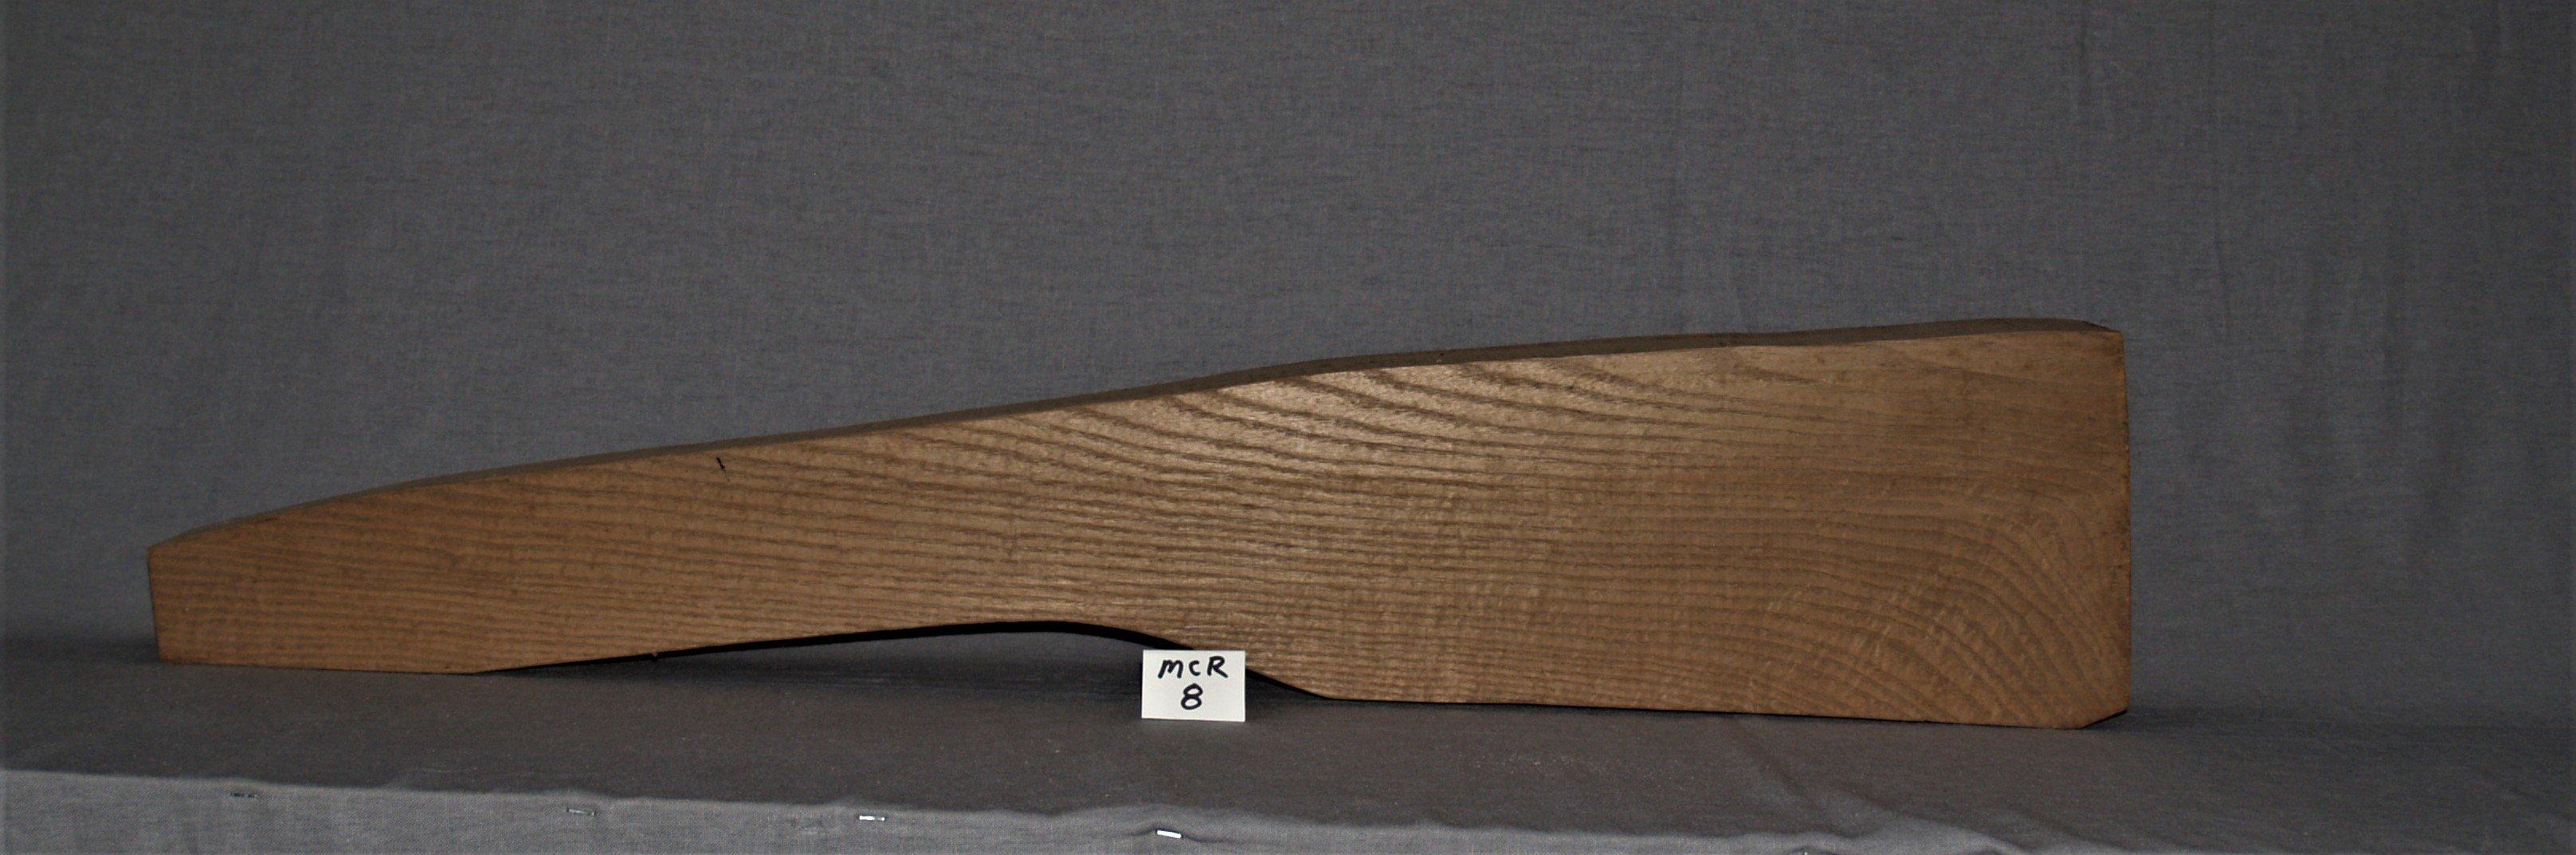 Sassafras Modern Custom Rifle Blank